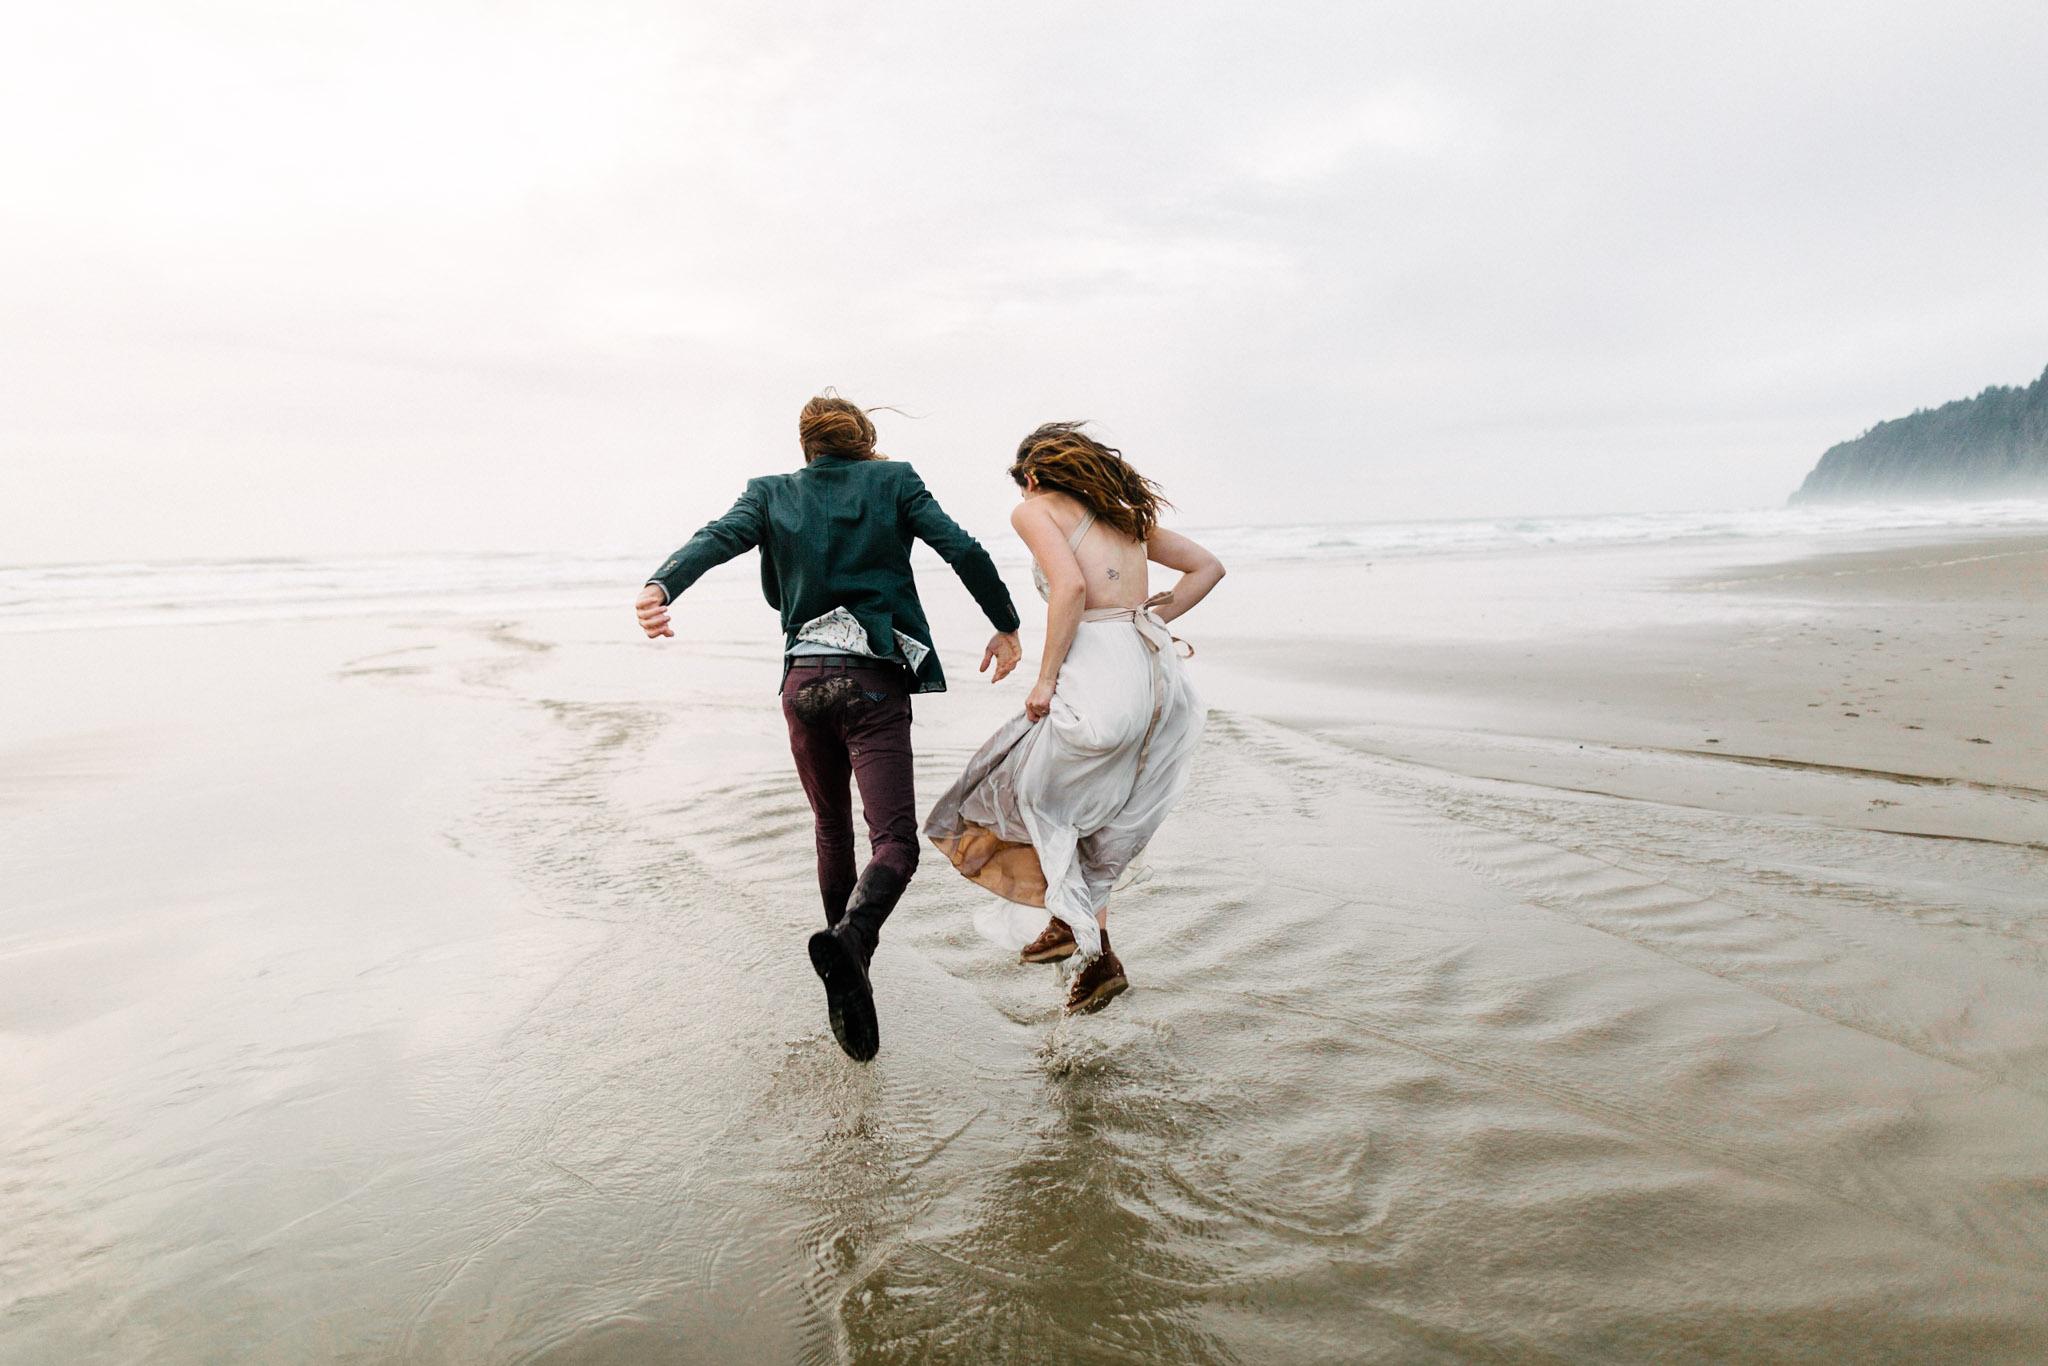 Oregon-Coast-Manzanita-Beach-Engagement-Pia-Anna-Christian-Wedding-Photography-PNW-GB-31.jpg